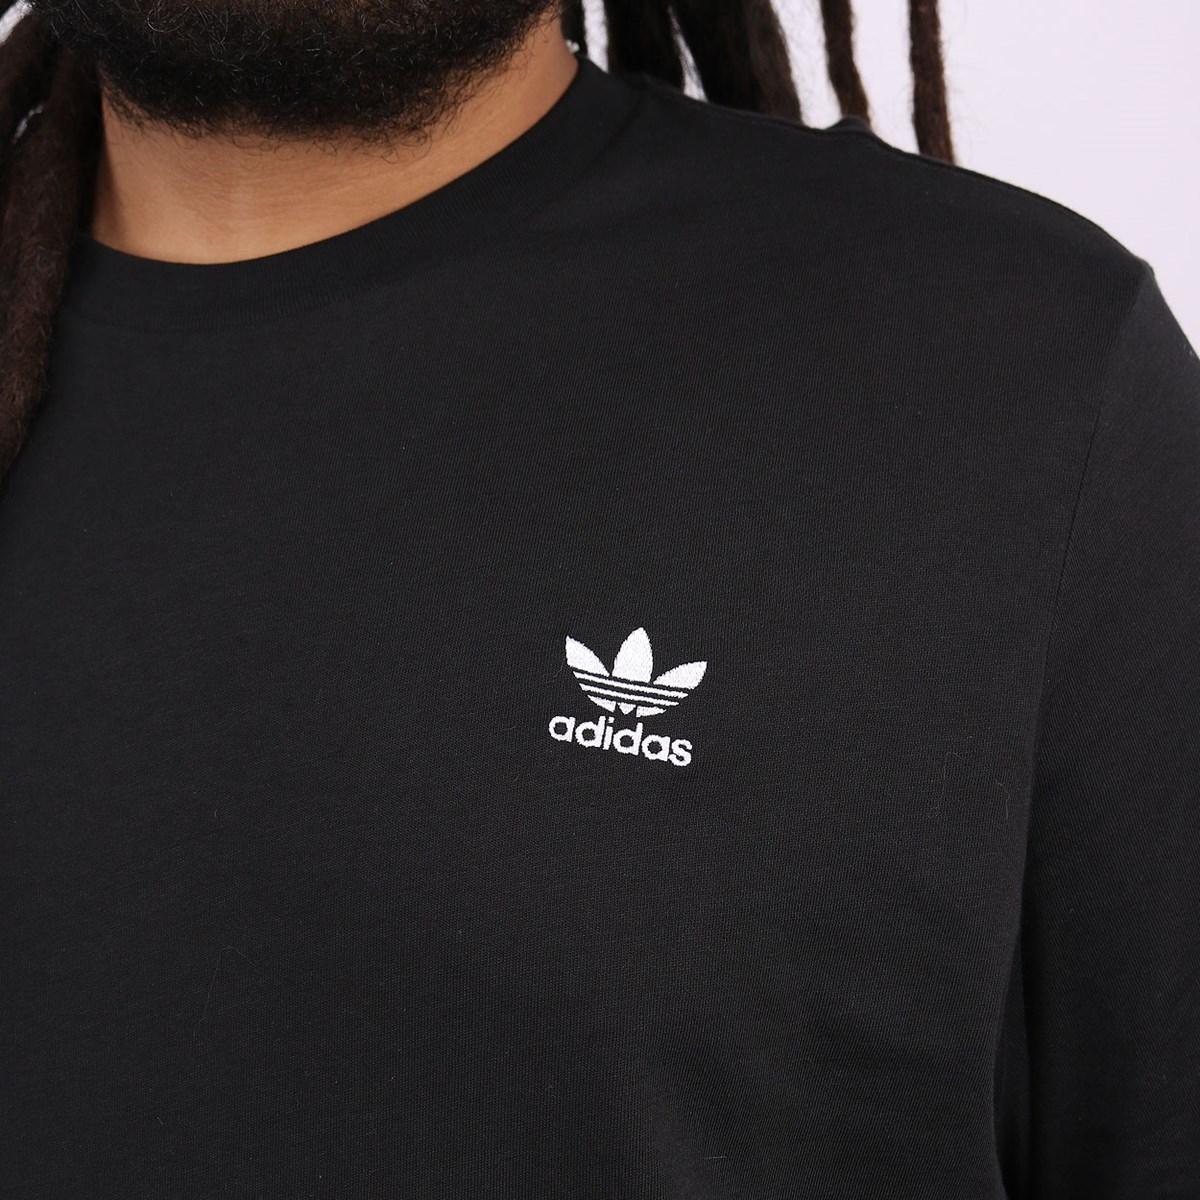 Camiseta Adidas Masculina Essential Tee Black FM9969